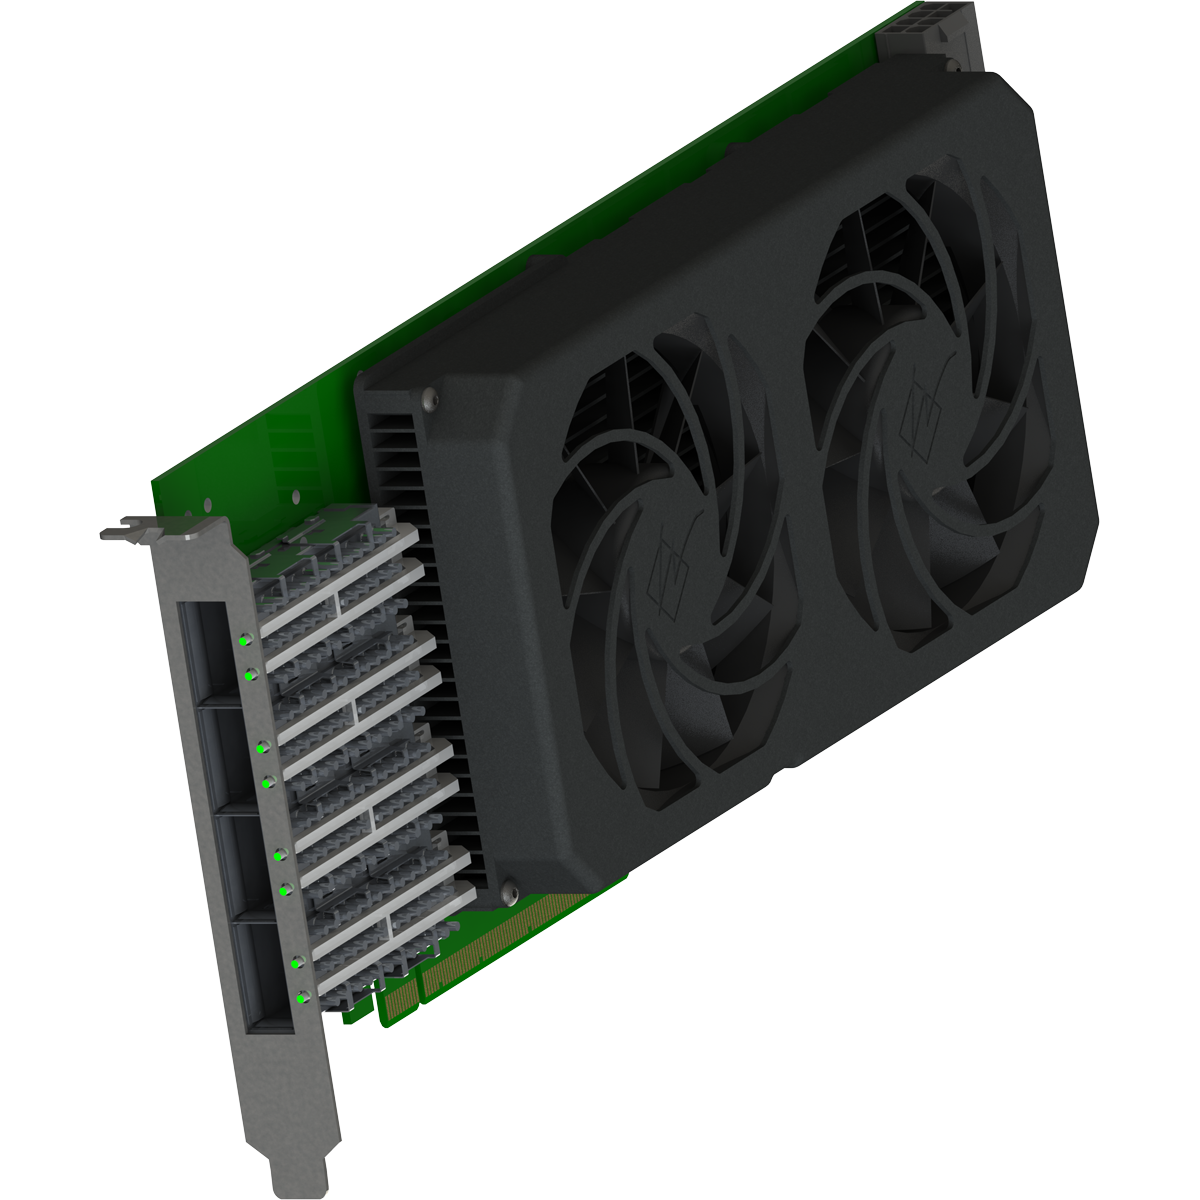 WSUKV PCIe HPC 2PE_Web - Annapolis Micro Systems, Inc